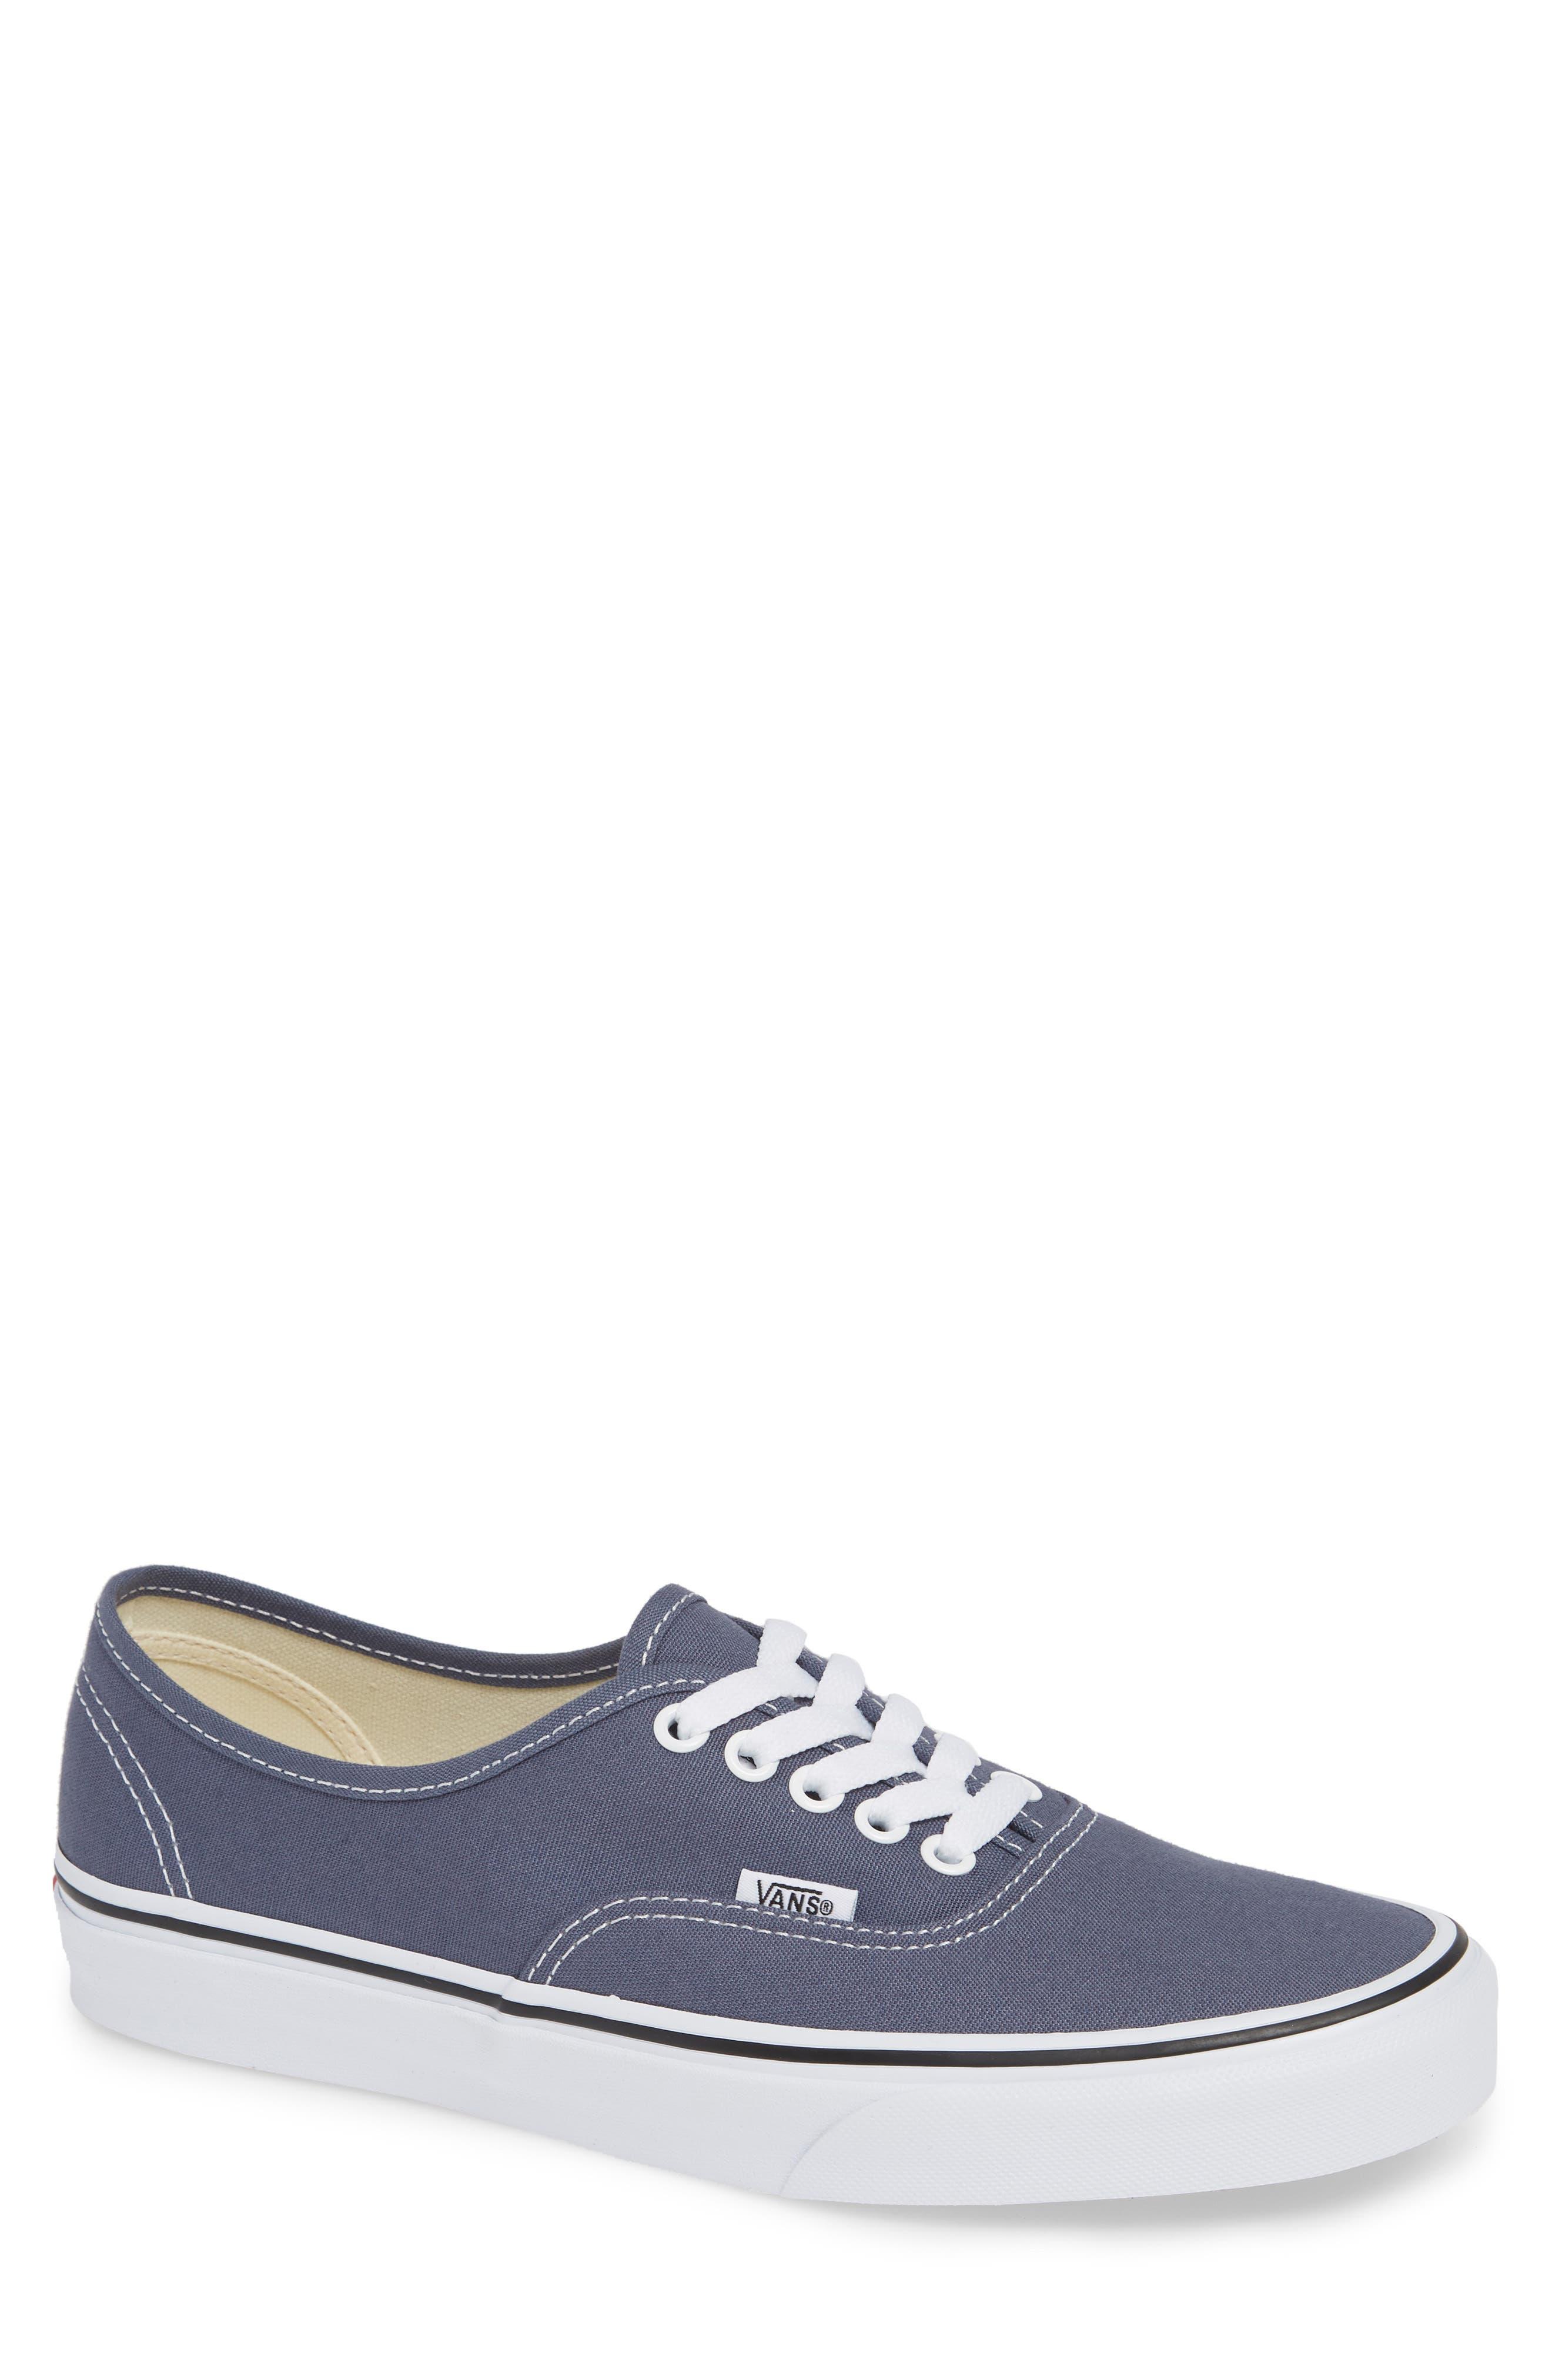 'Authentic' Sneaker,                             Main thumbnail 1, color,                             GREY/ TRUE WHITE